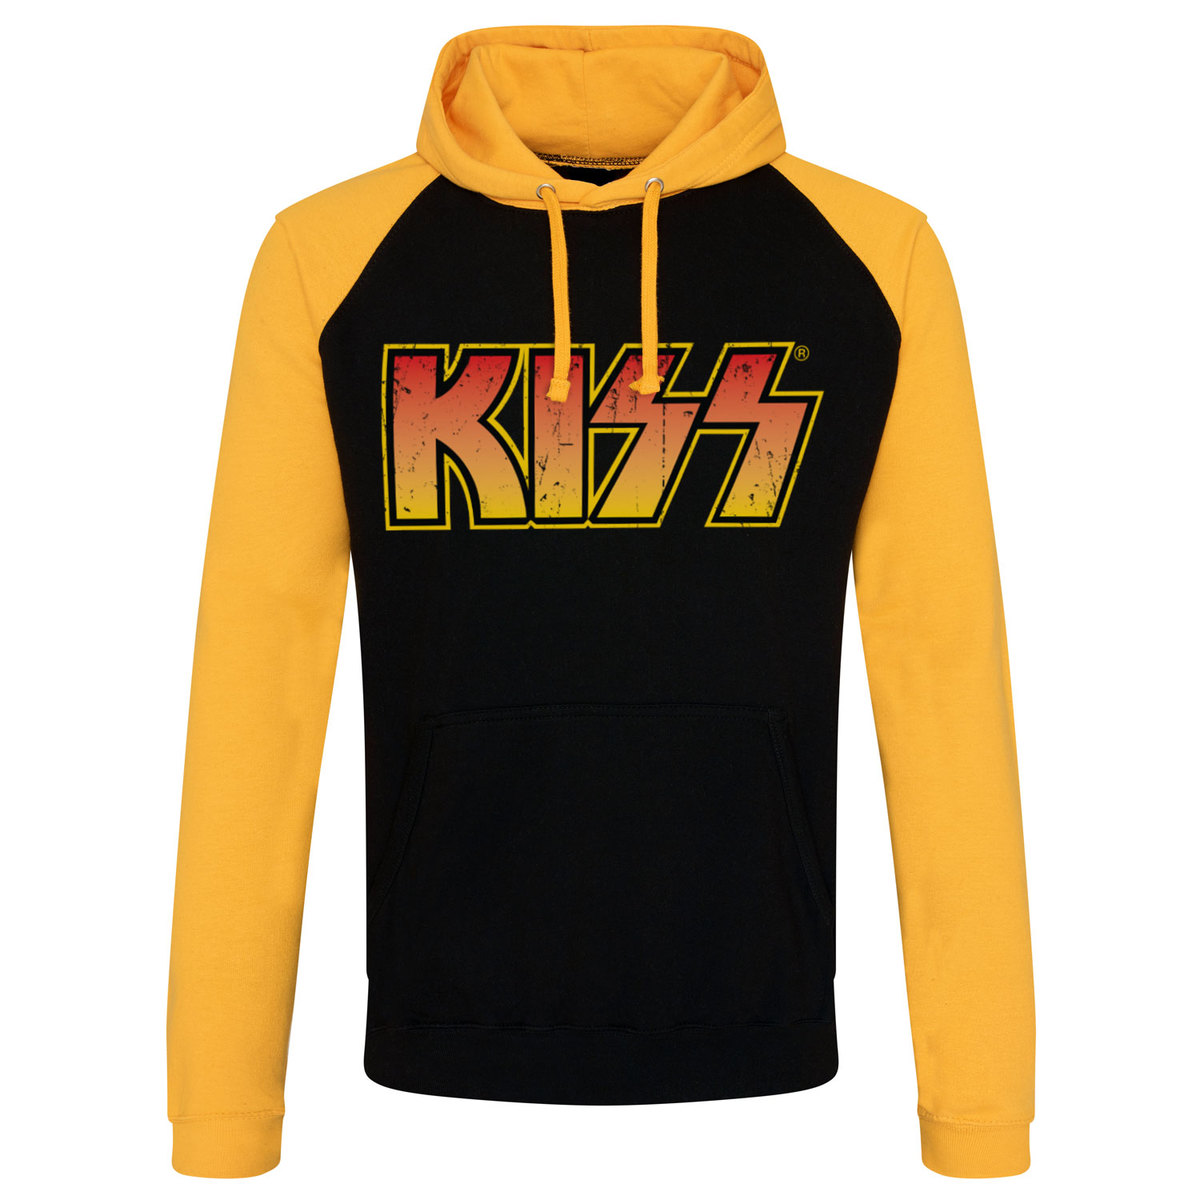 c2e7266843e1 mikina pánská KISS - Distressed Logotype - Black Yellow - HYBRIS ...